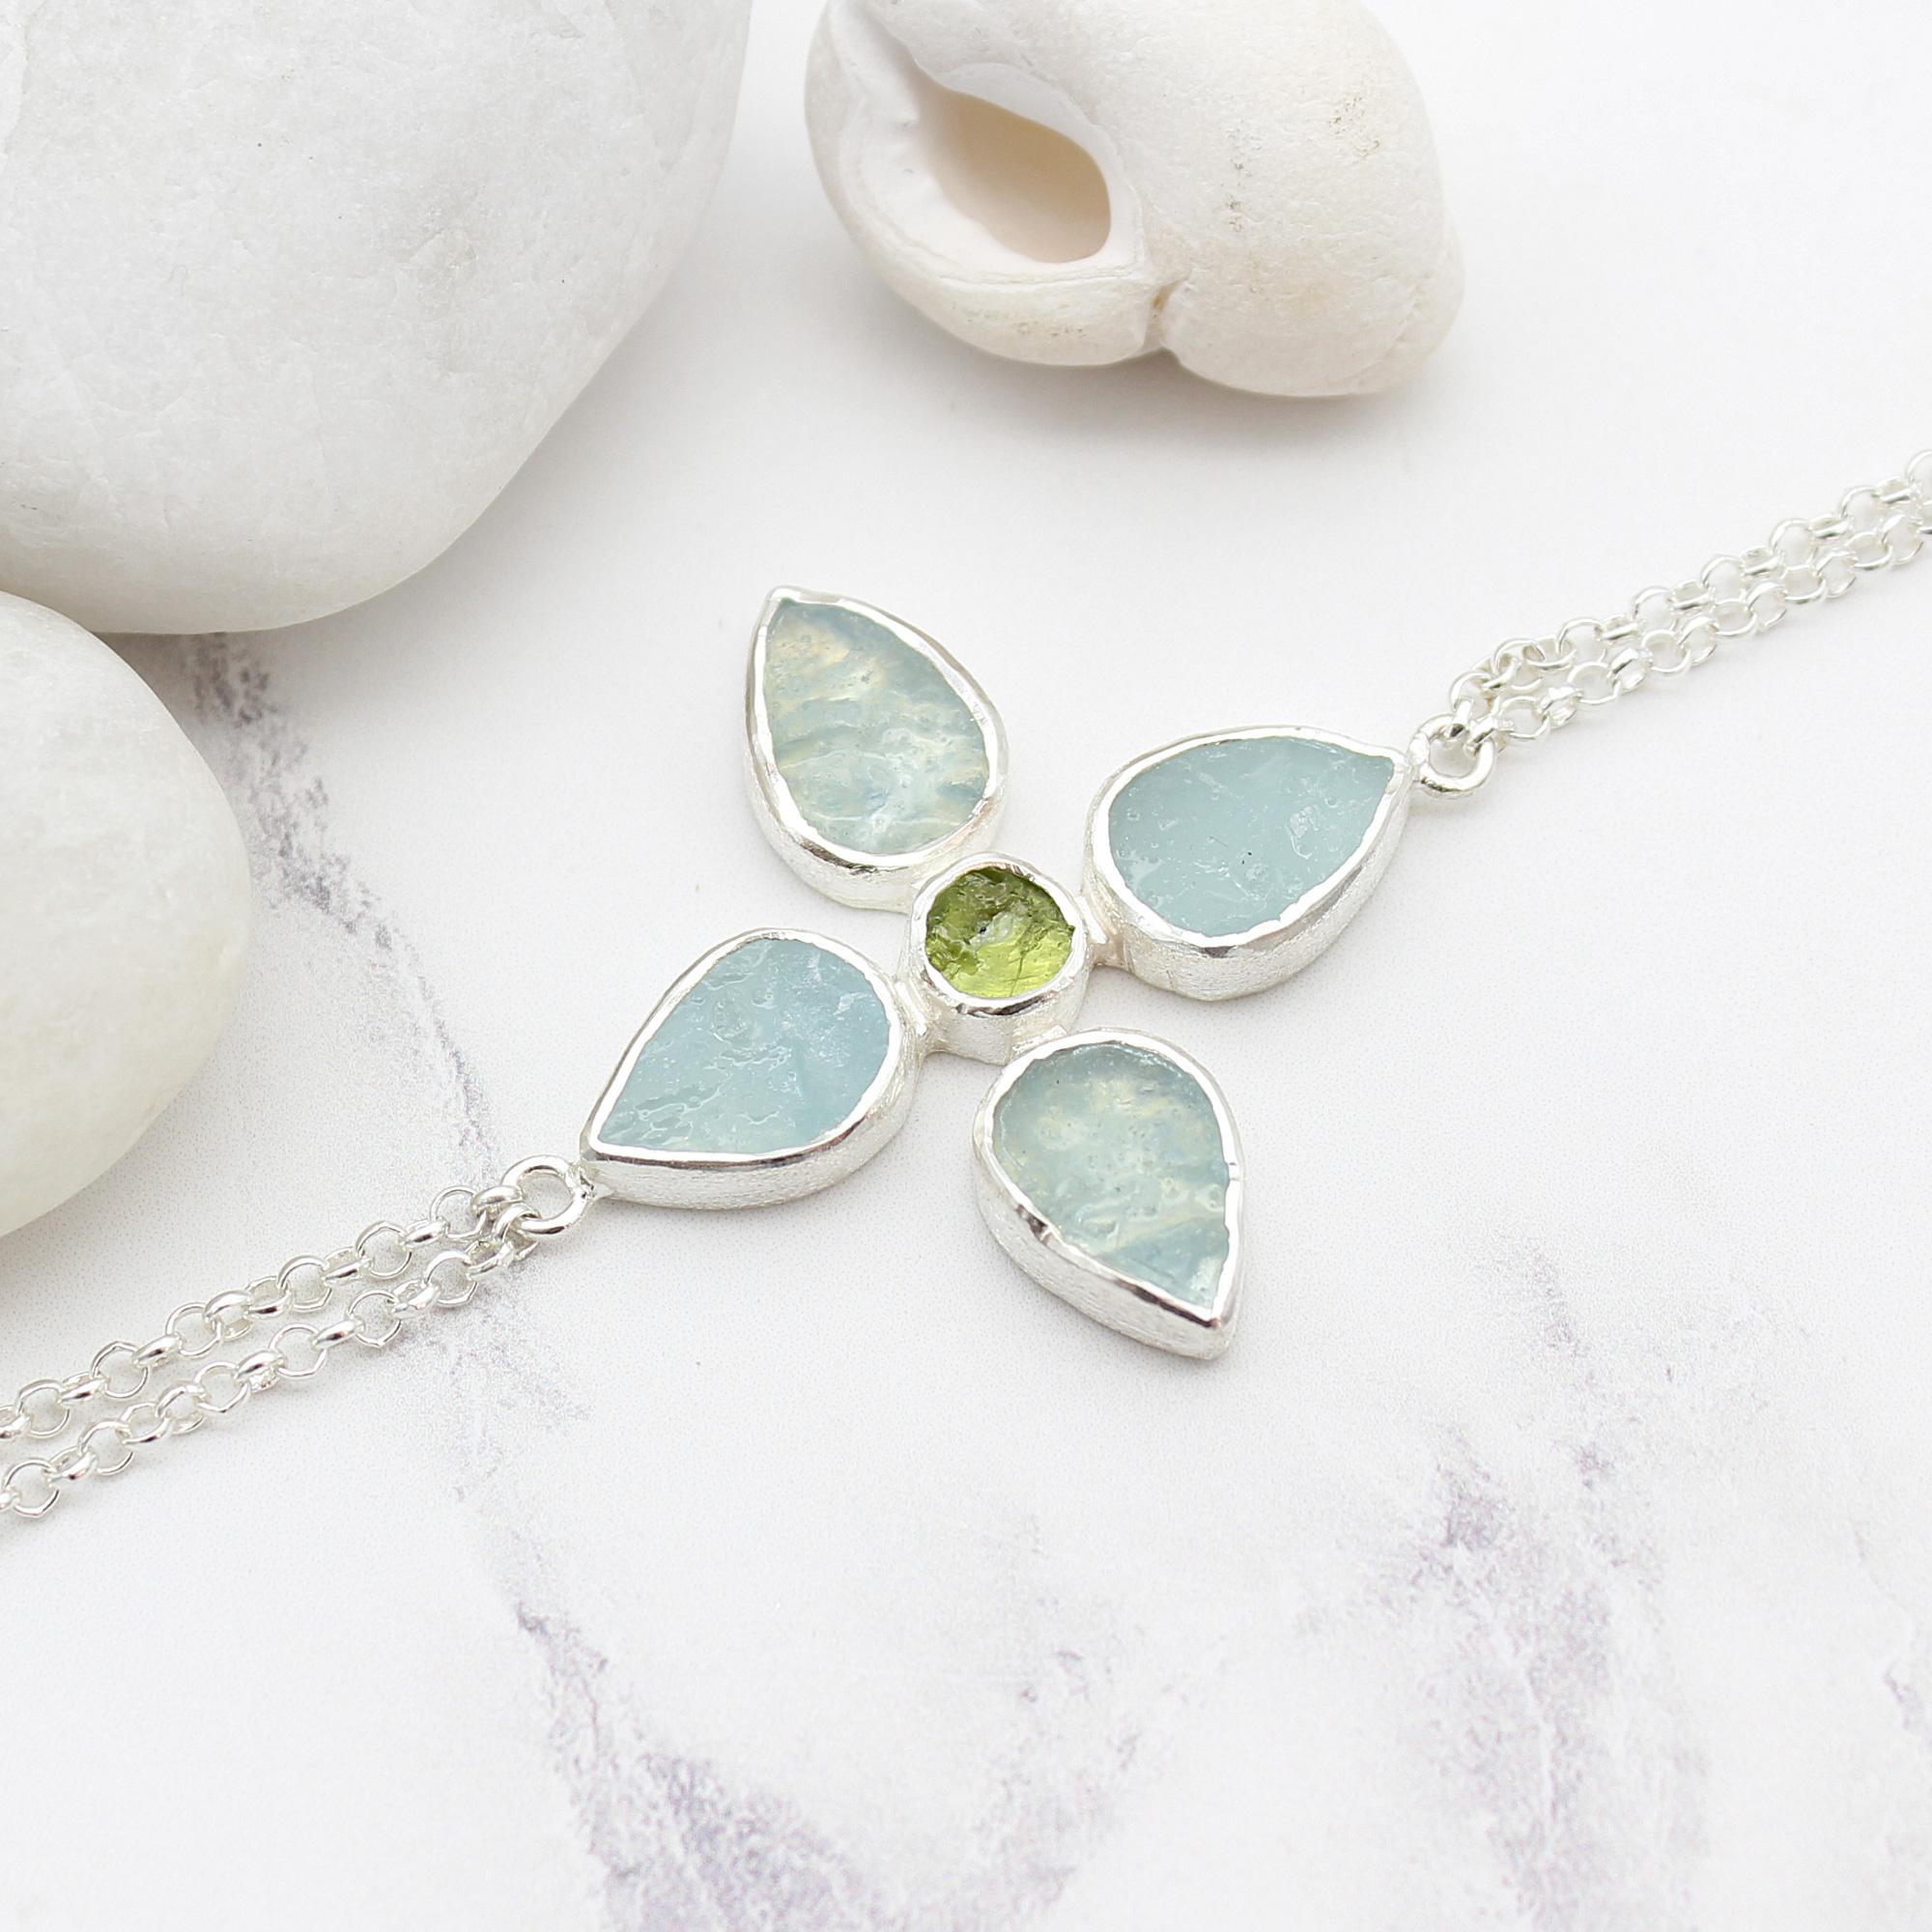 Handmade Aquamarine & Peridot Gemstone Flower Sterling Silver Bracelet